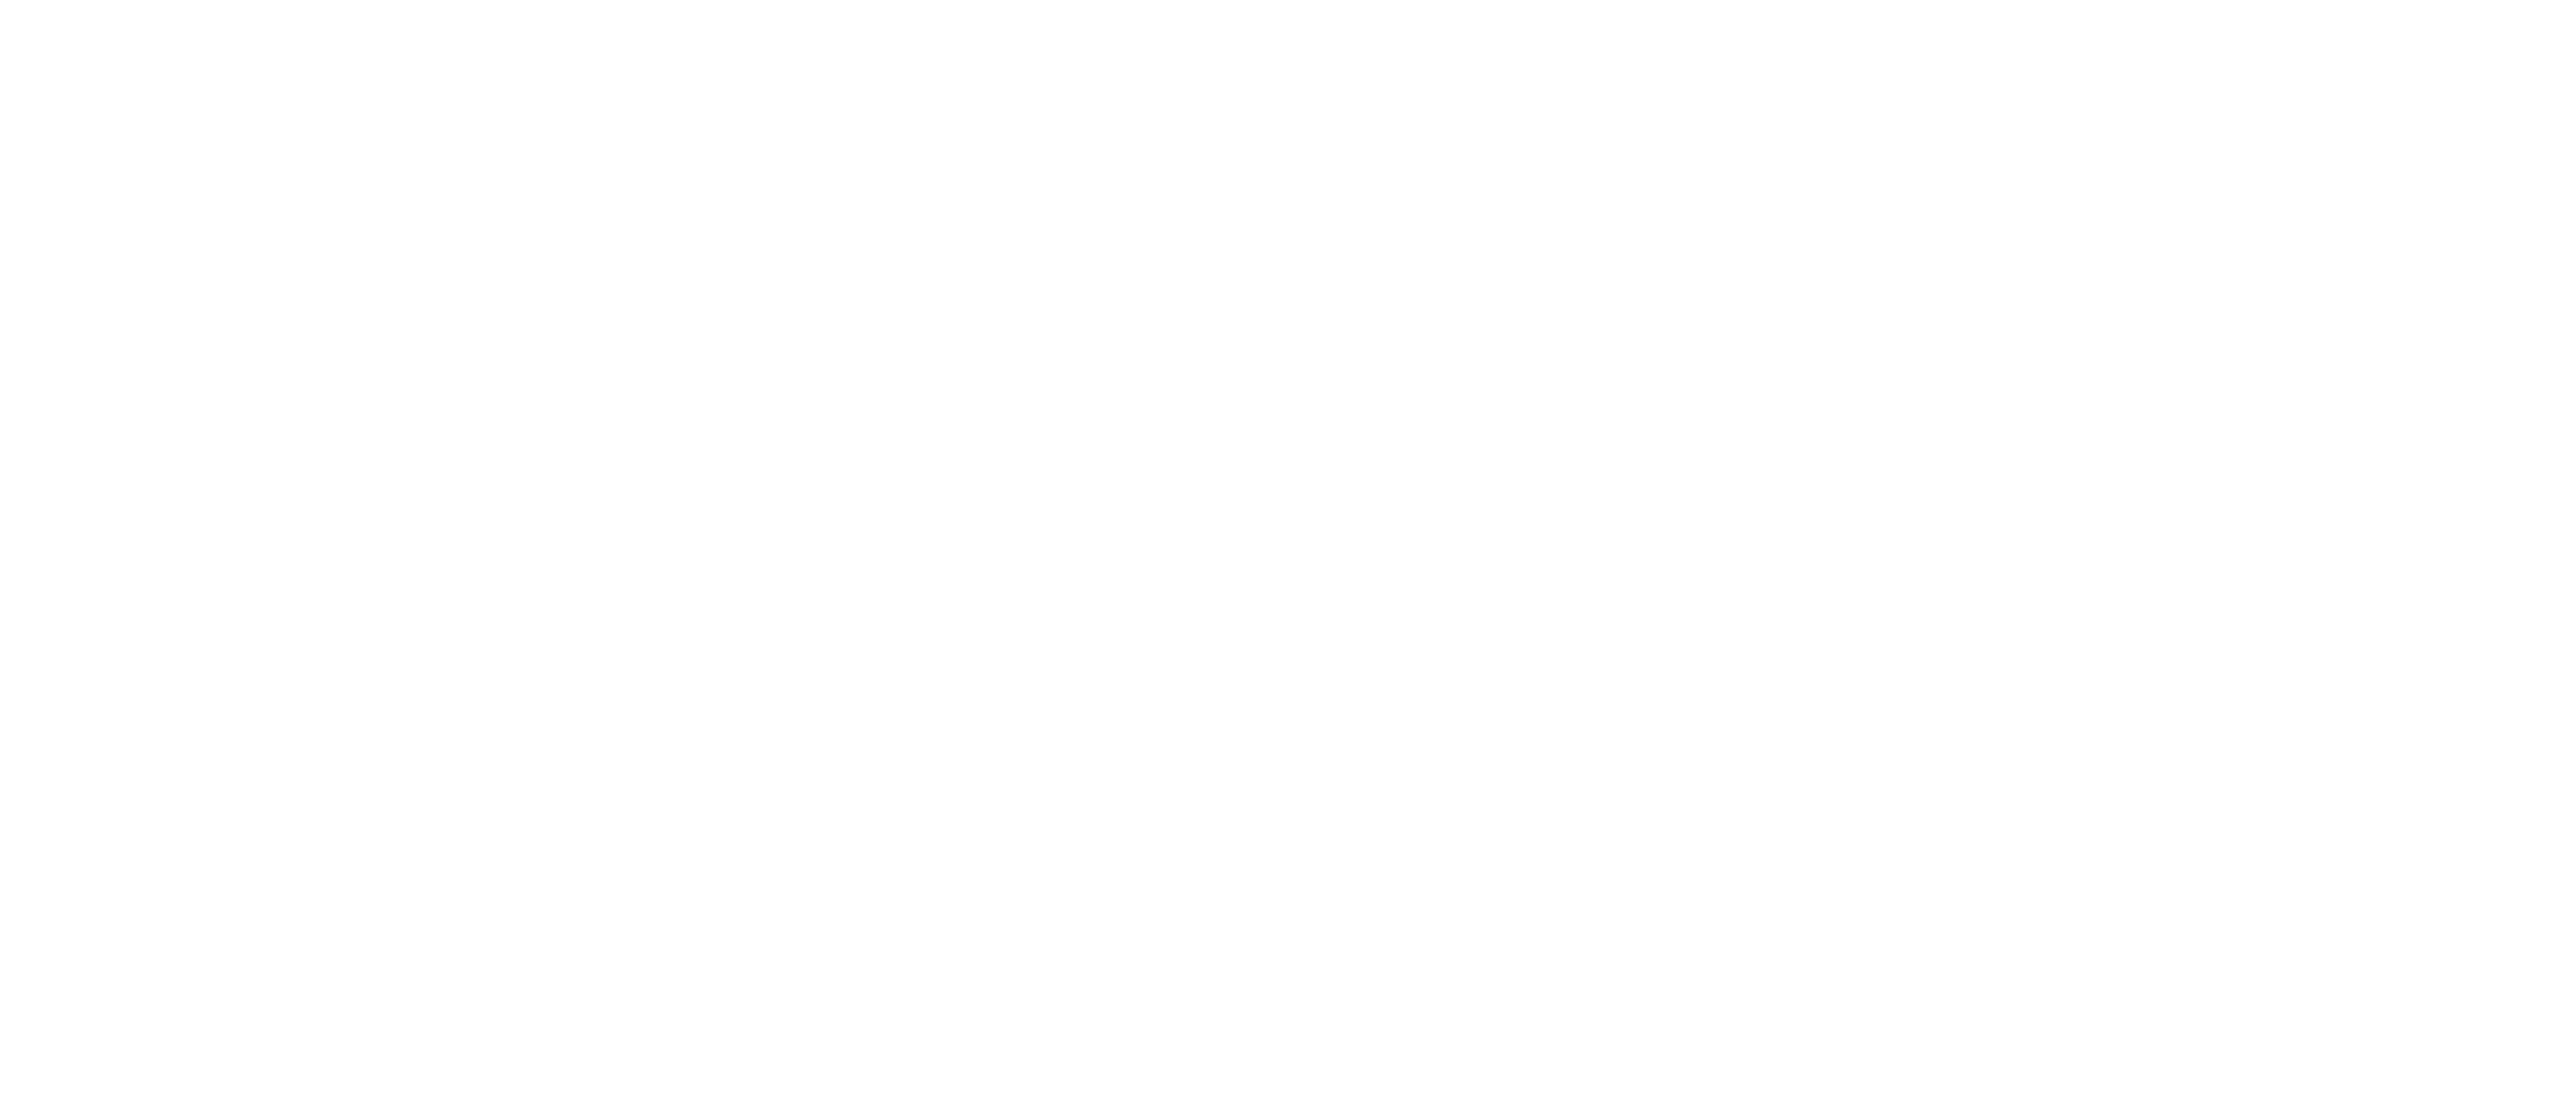 https://www.hagadone.com/project/uploads/2020/08/Logo-CB-white.png